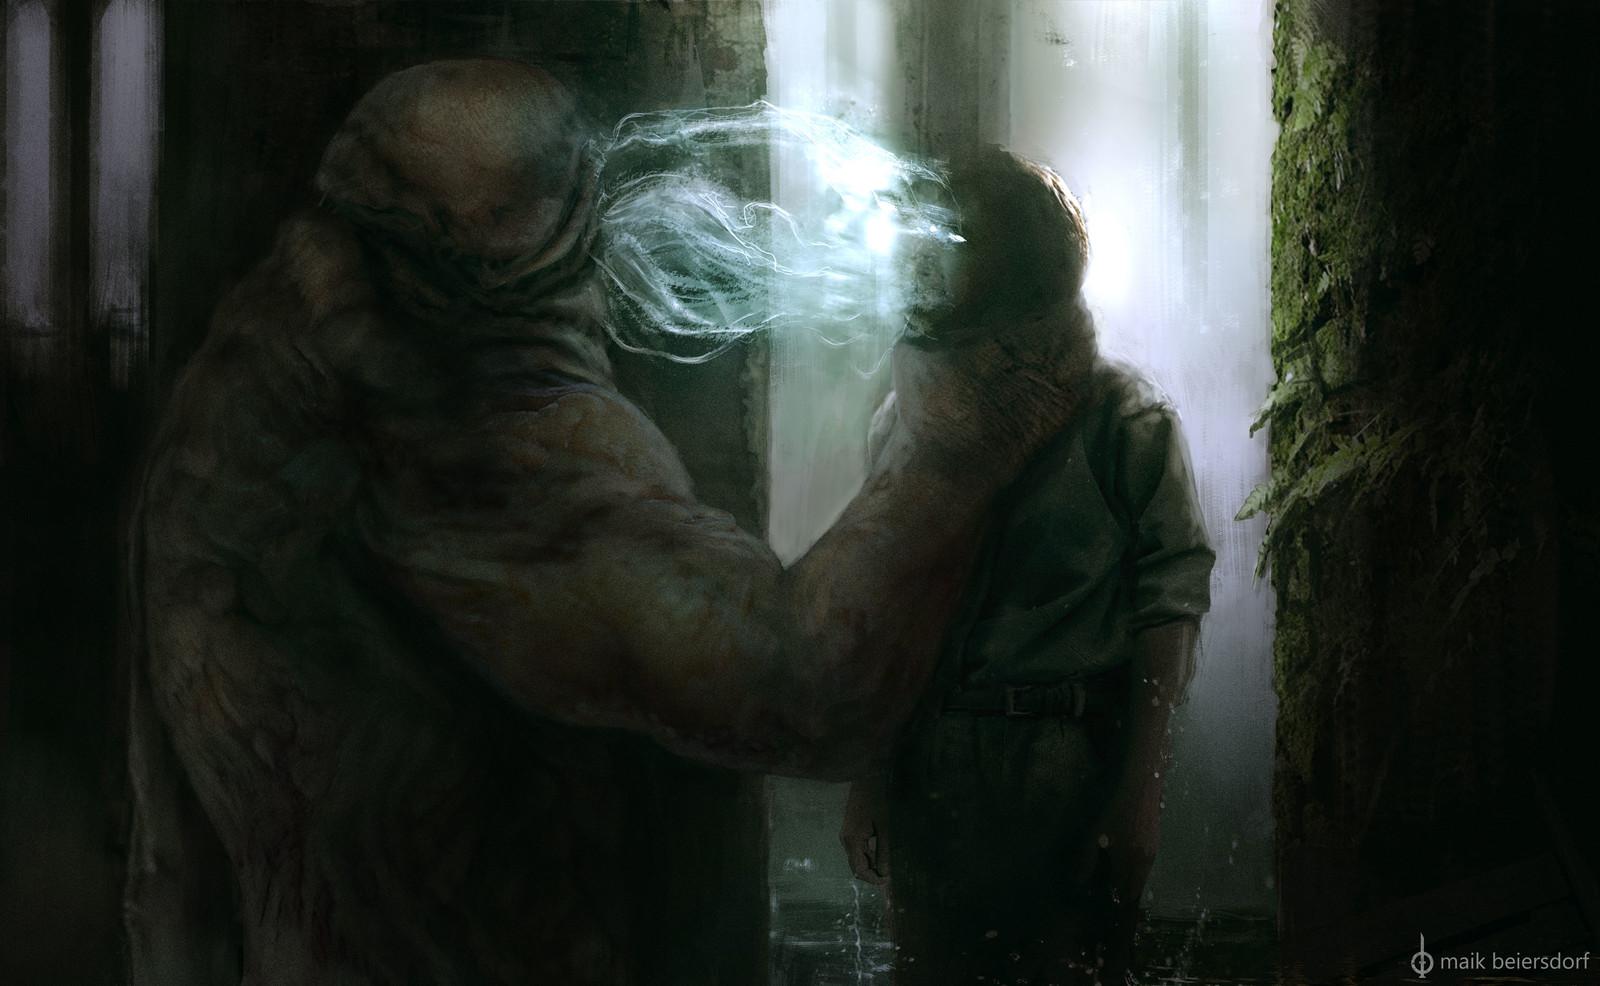 Ospel's Creature Keyframe